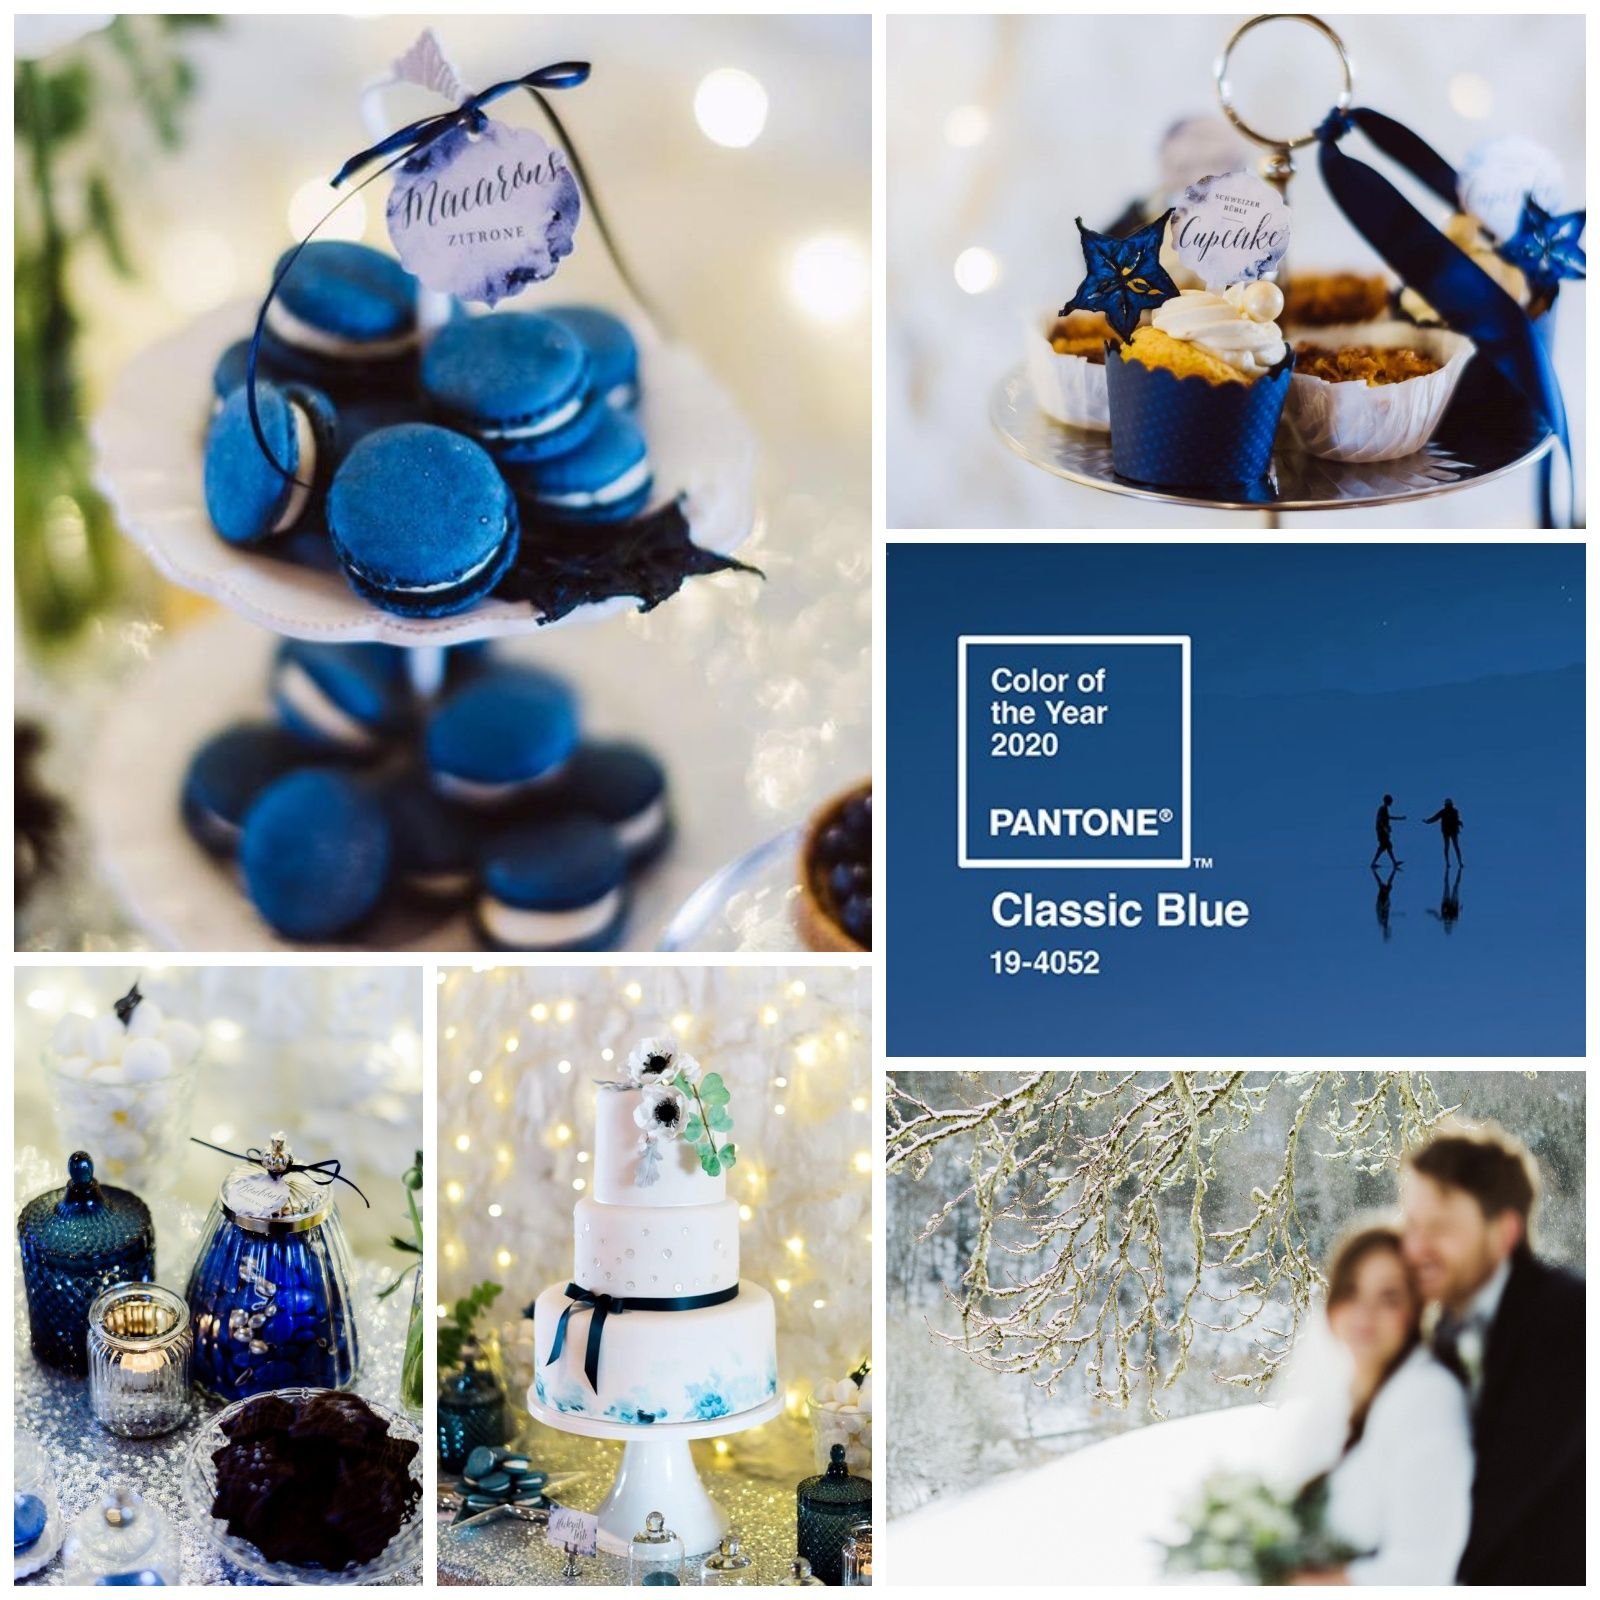 Pantone Color Of The Year 2020 Classic Blue Hochzeitstorte Hochzeit Farbe Des Jahres